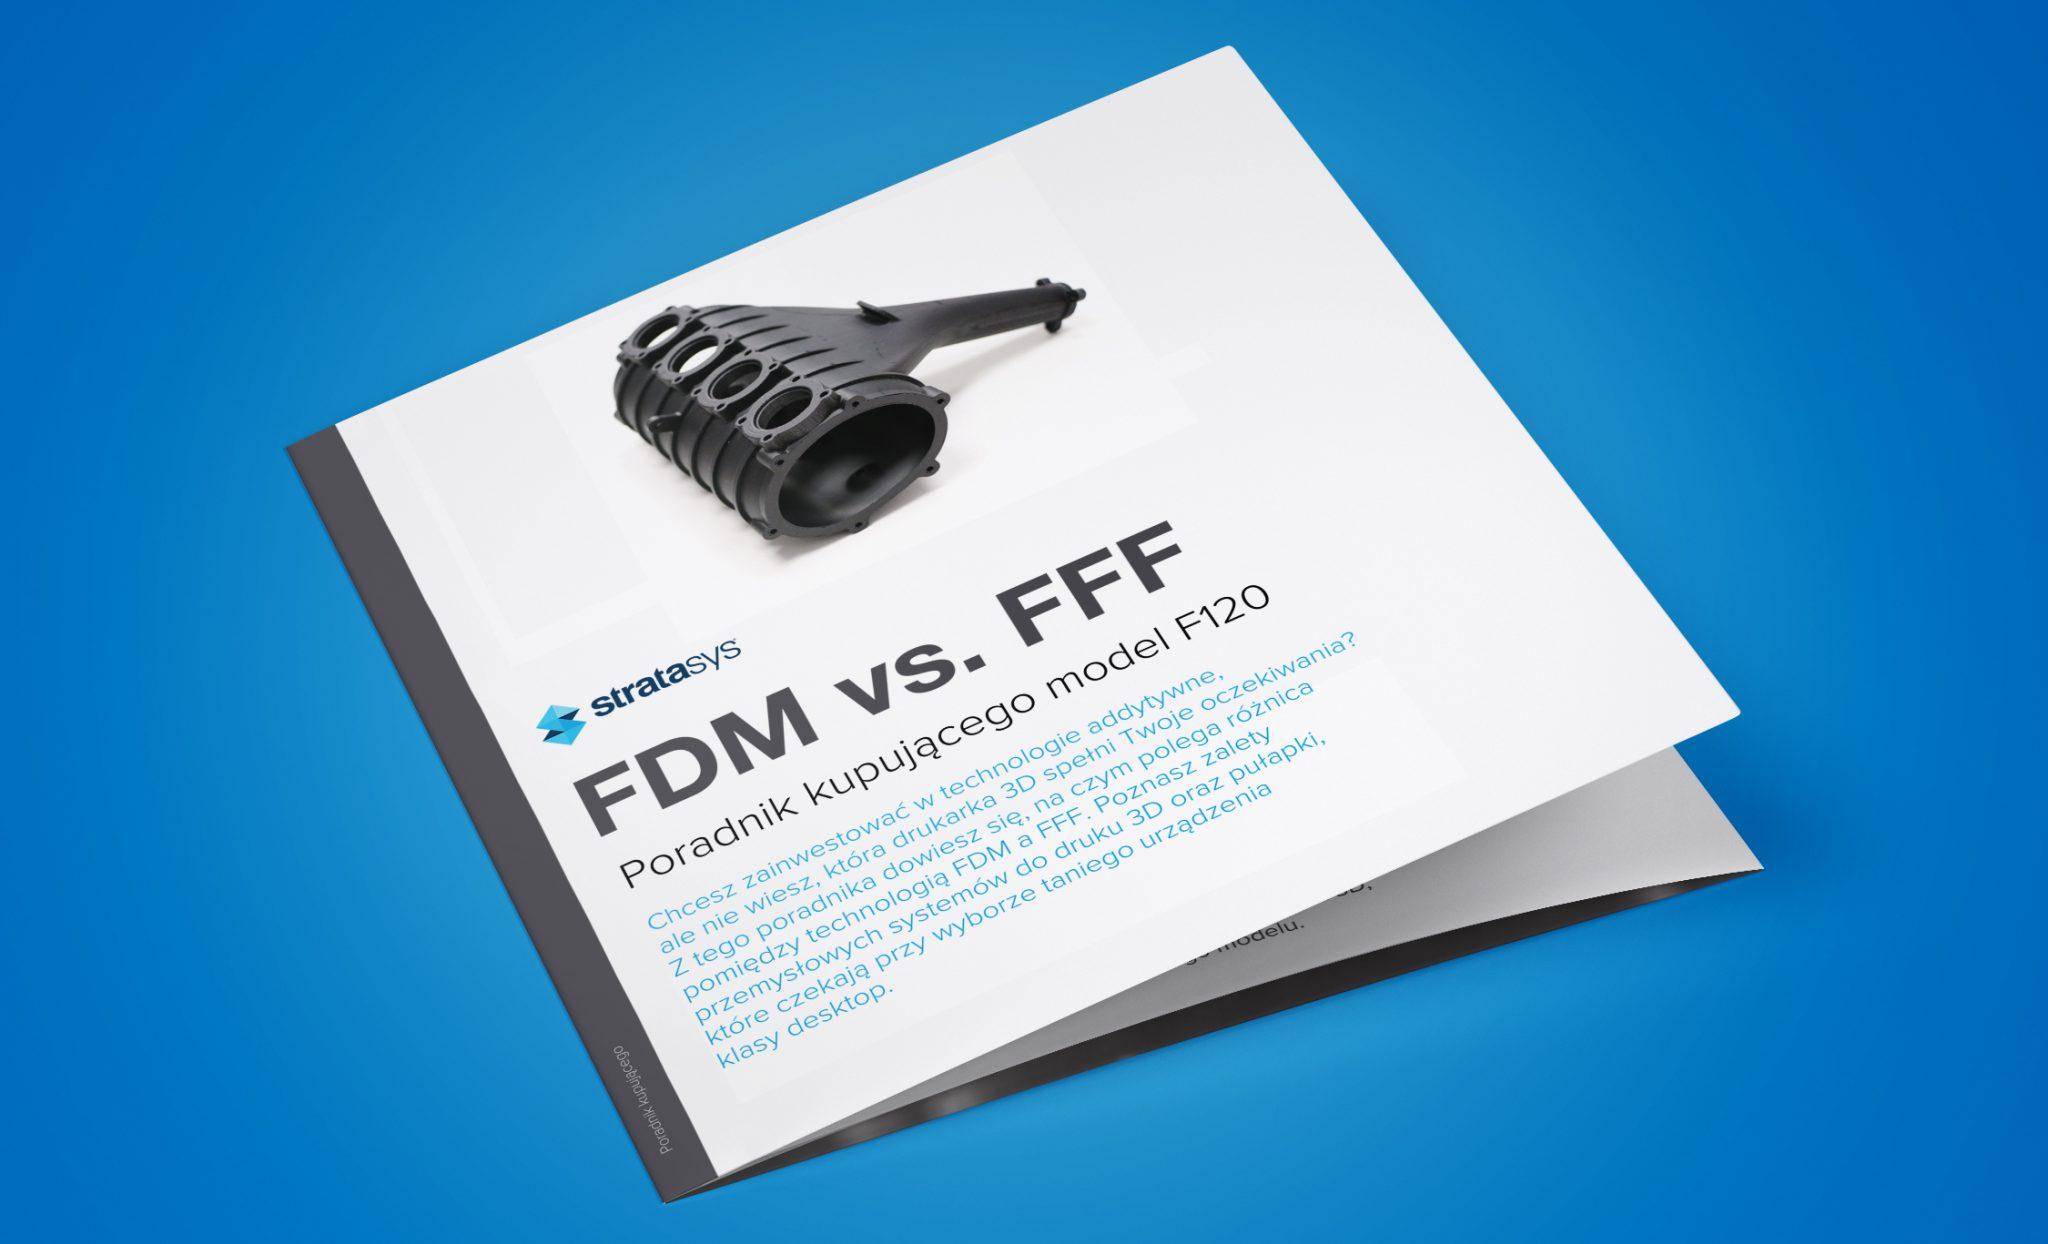 poradnik fdm fff